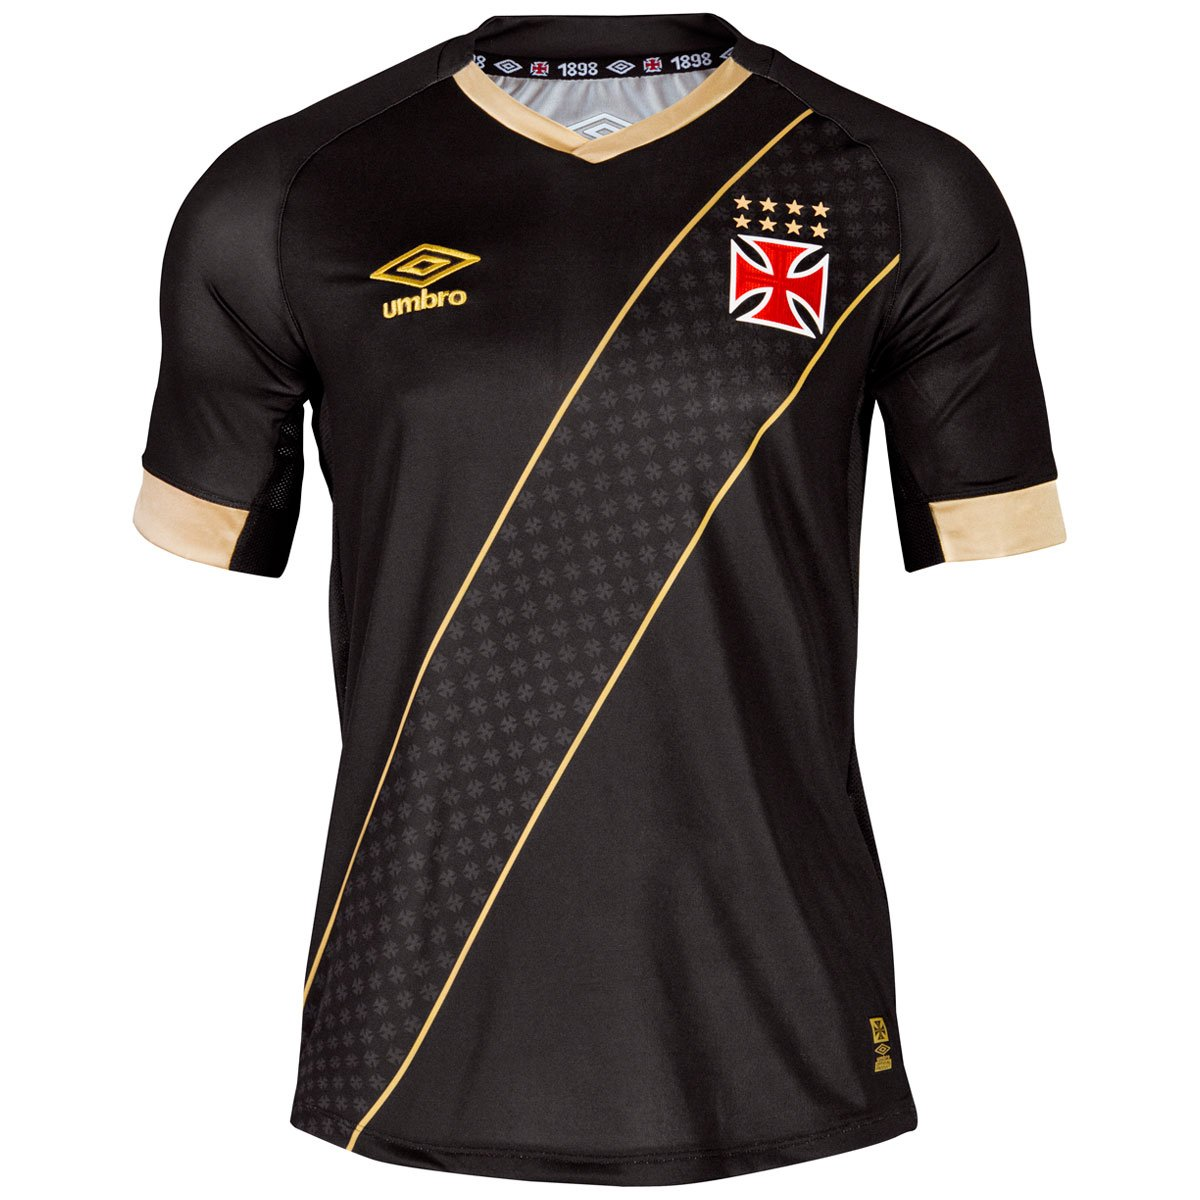 ad09e9895b Camisa Feminina Umbro Vasco III 2015 s nº - Compre Agora